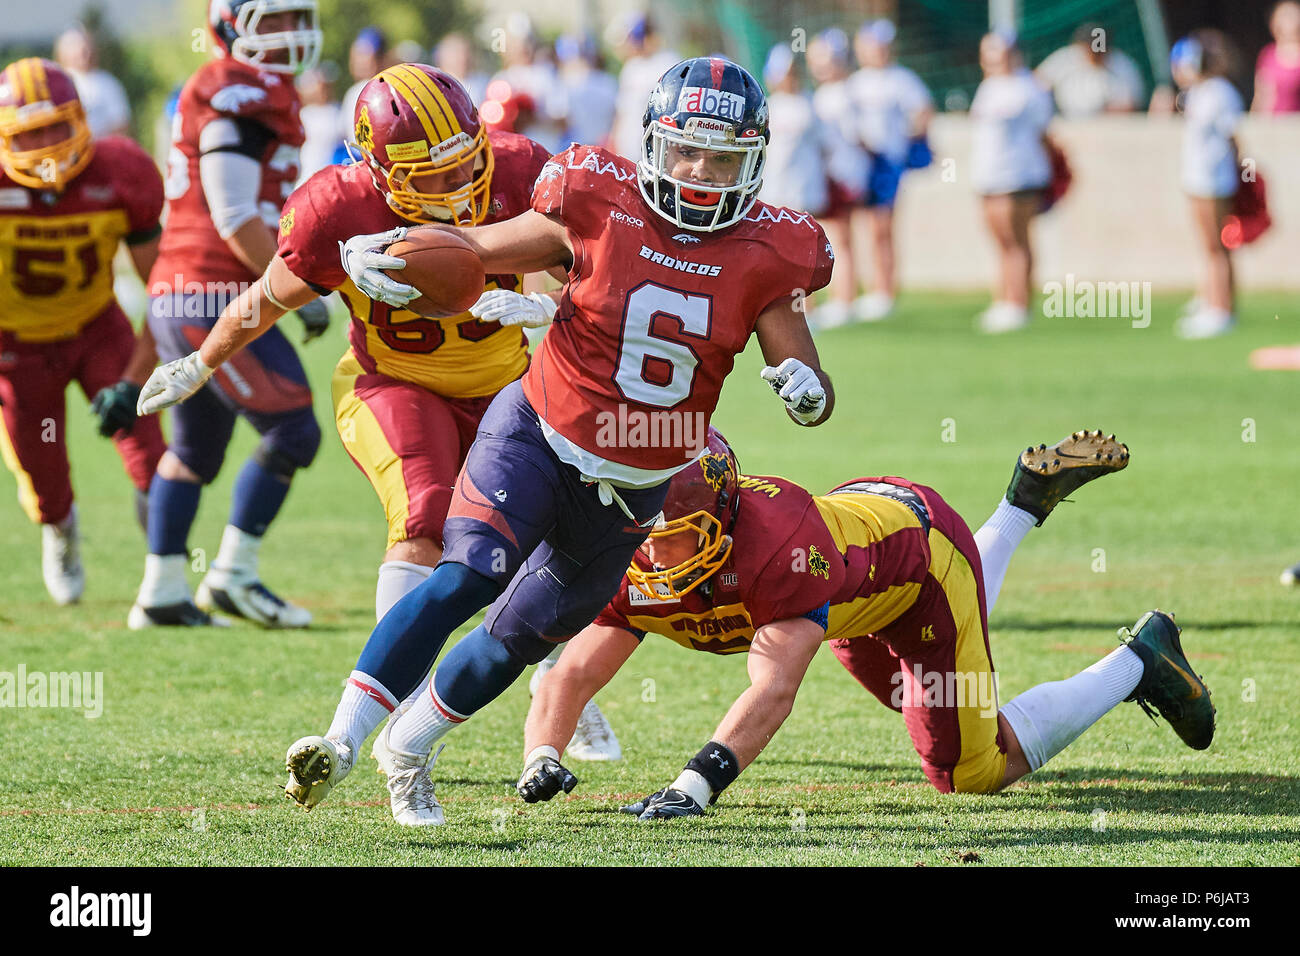 Chur, Switzerland. 30th June 2018. Erik Rageth during the American Football Swiss Bowl Play-of Game Calanda Broncos vs. Winterthur Warriors. Credit: Rolf Simeon/Alamy Live News - Stock Image